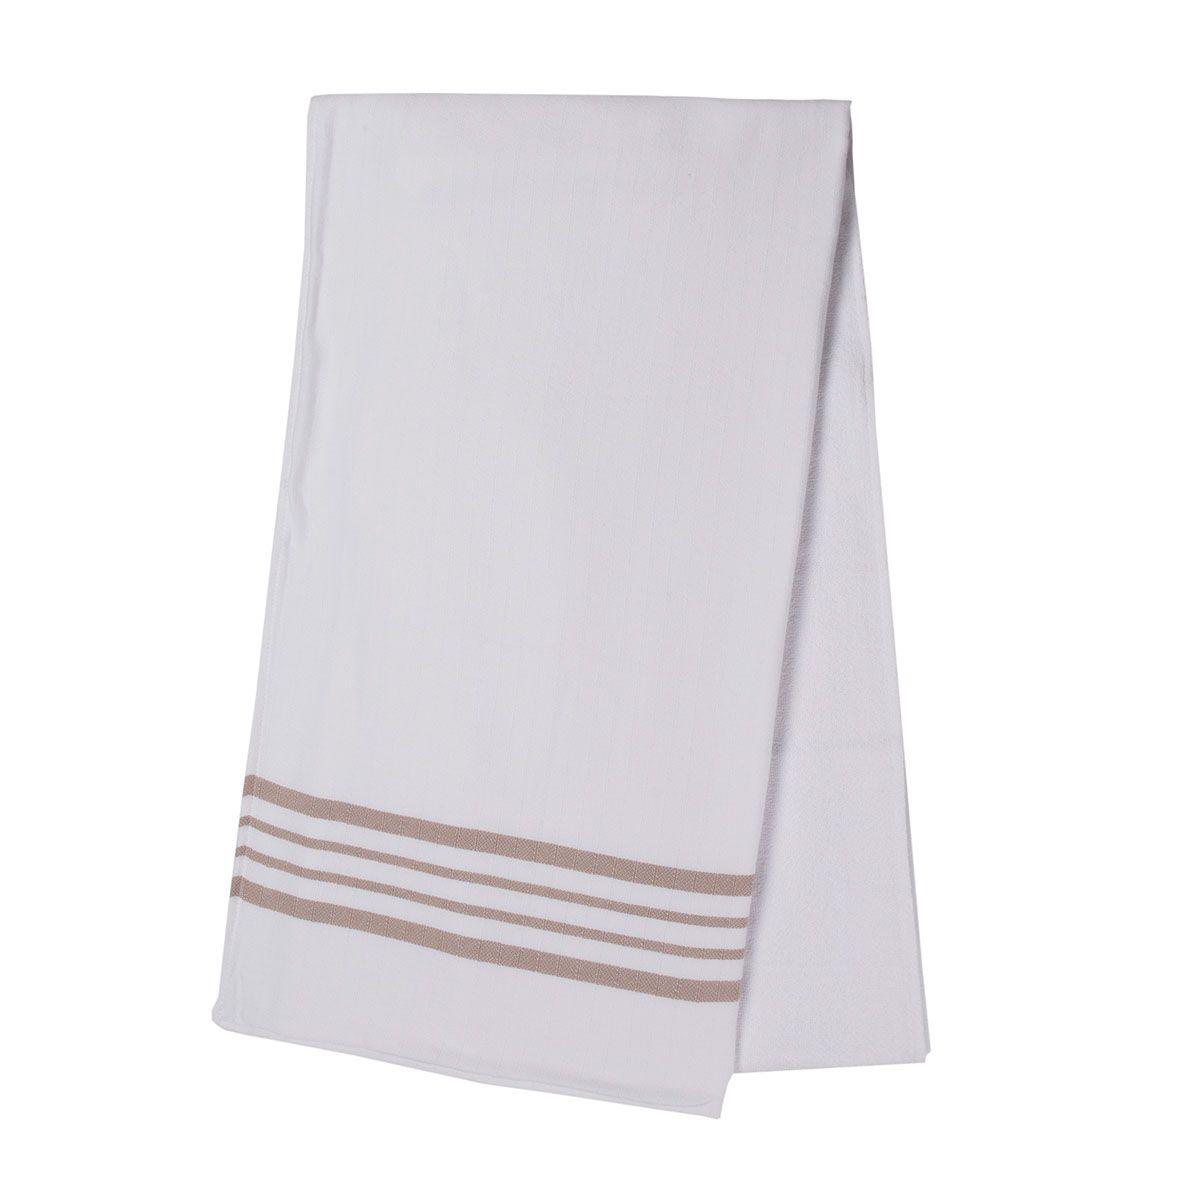 Peshtowel White Sultan - Double Face / Taupe Stripes